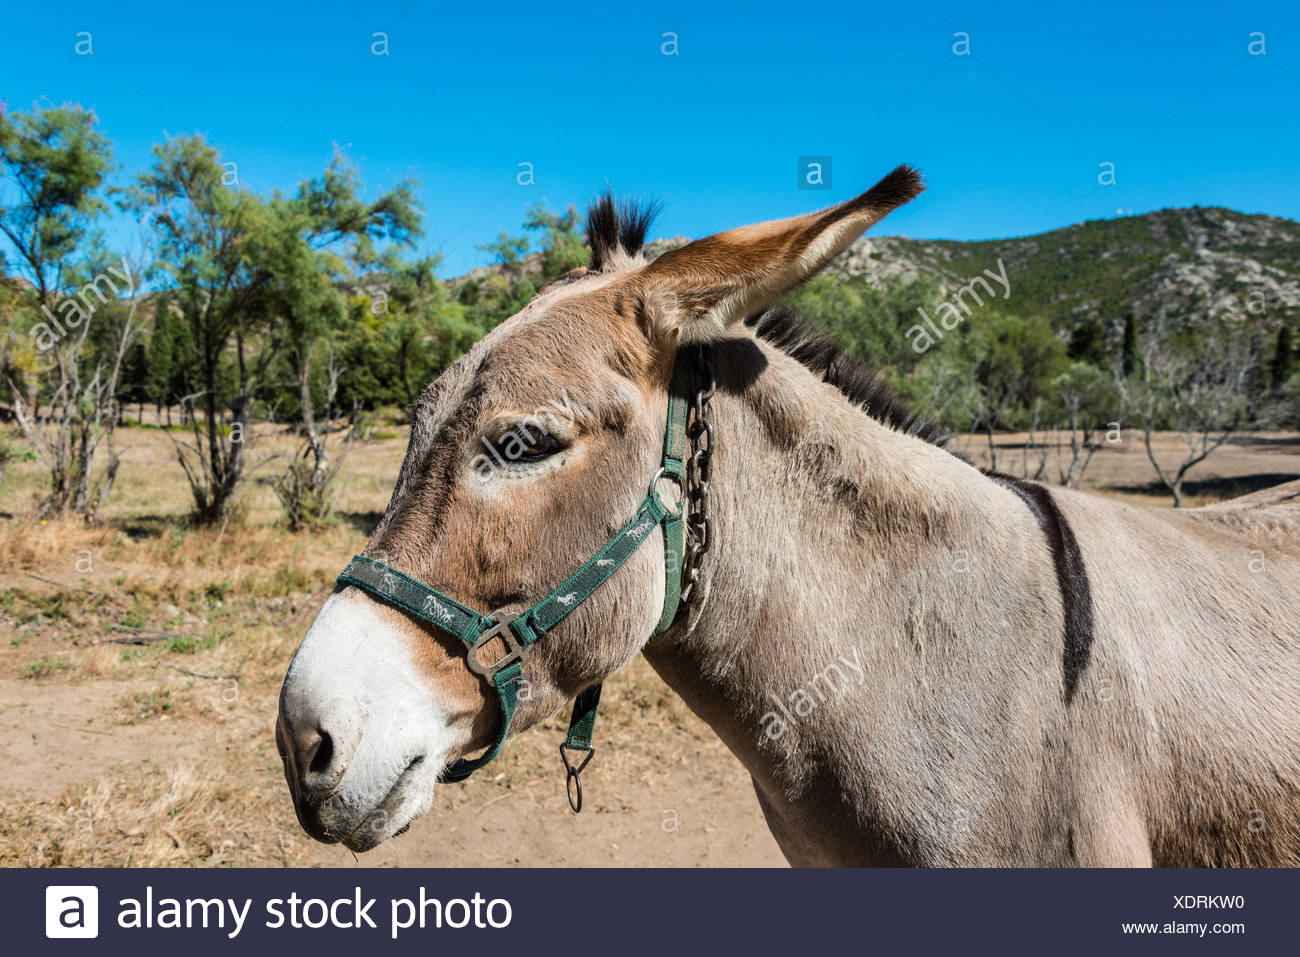 Donkey (Equus africanus asinus), Corsica, France Stock Photo